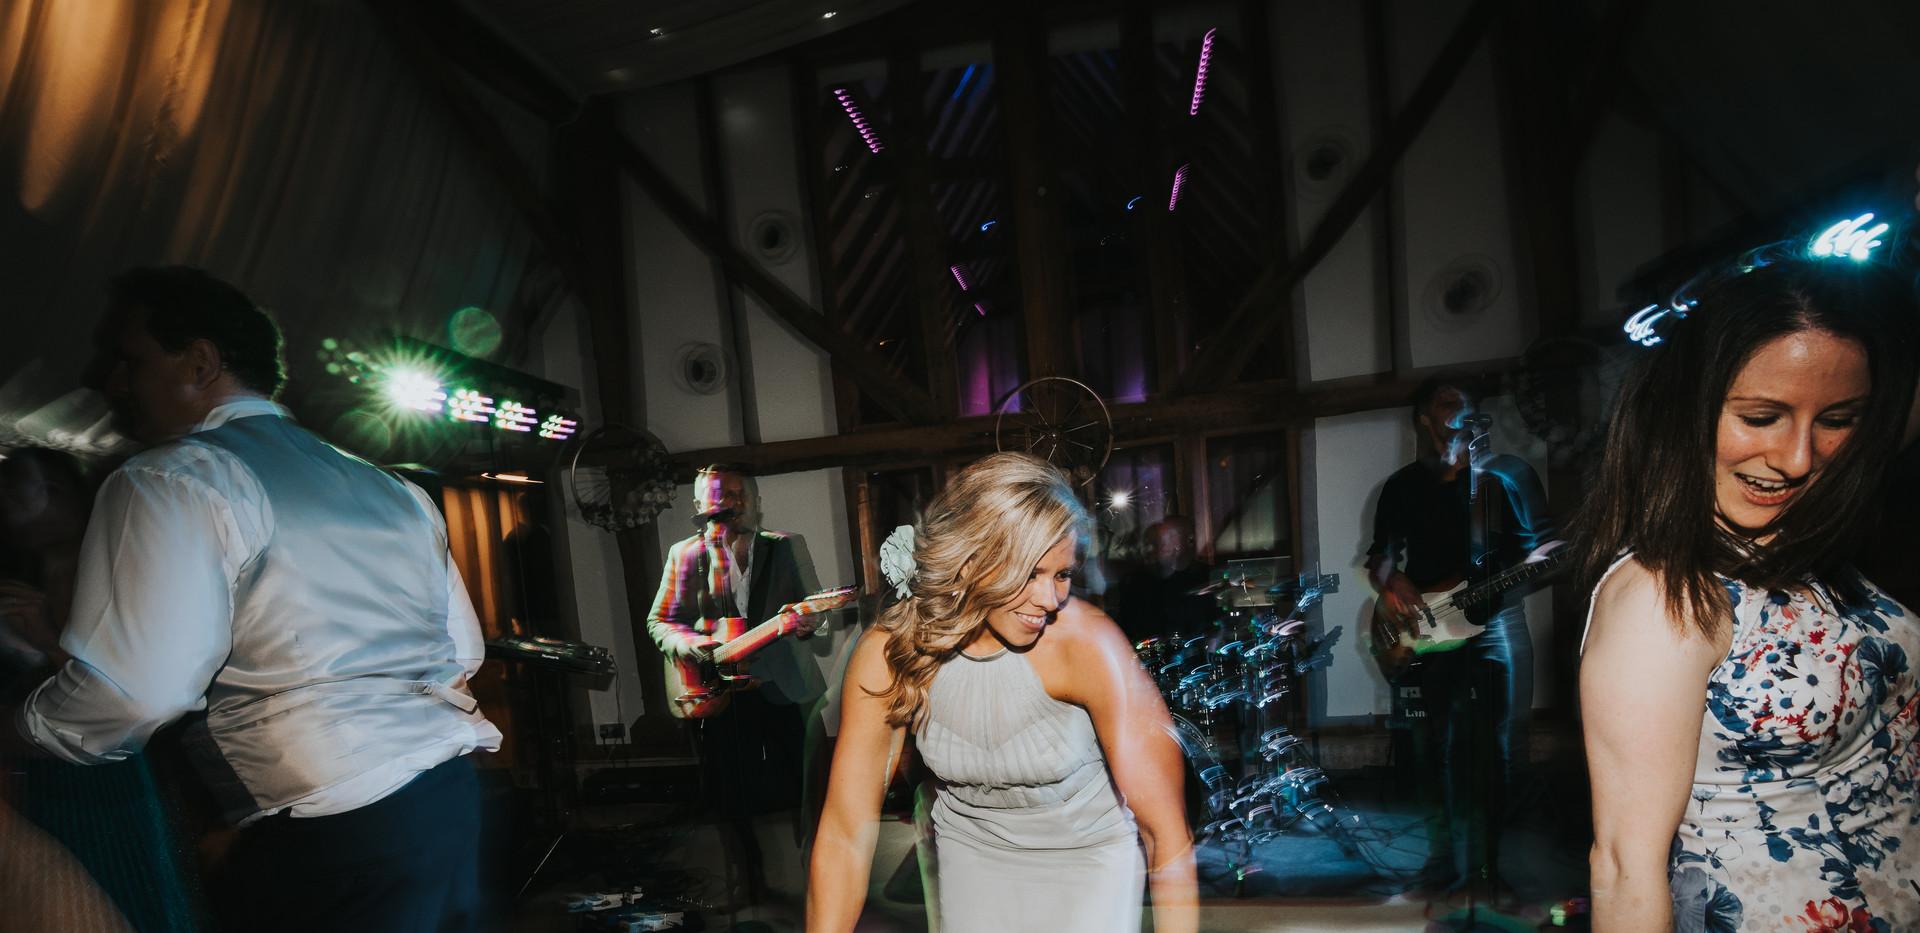 The Sam Lewis Band - South Farm - Tom Halliday Photography